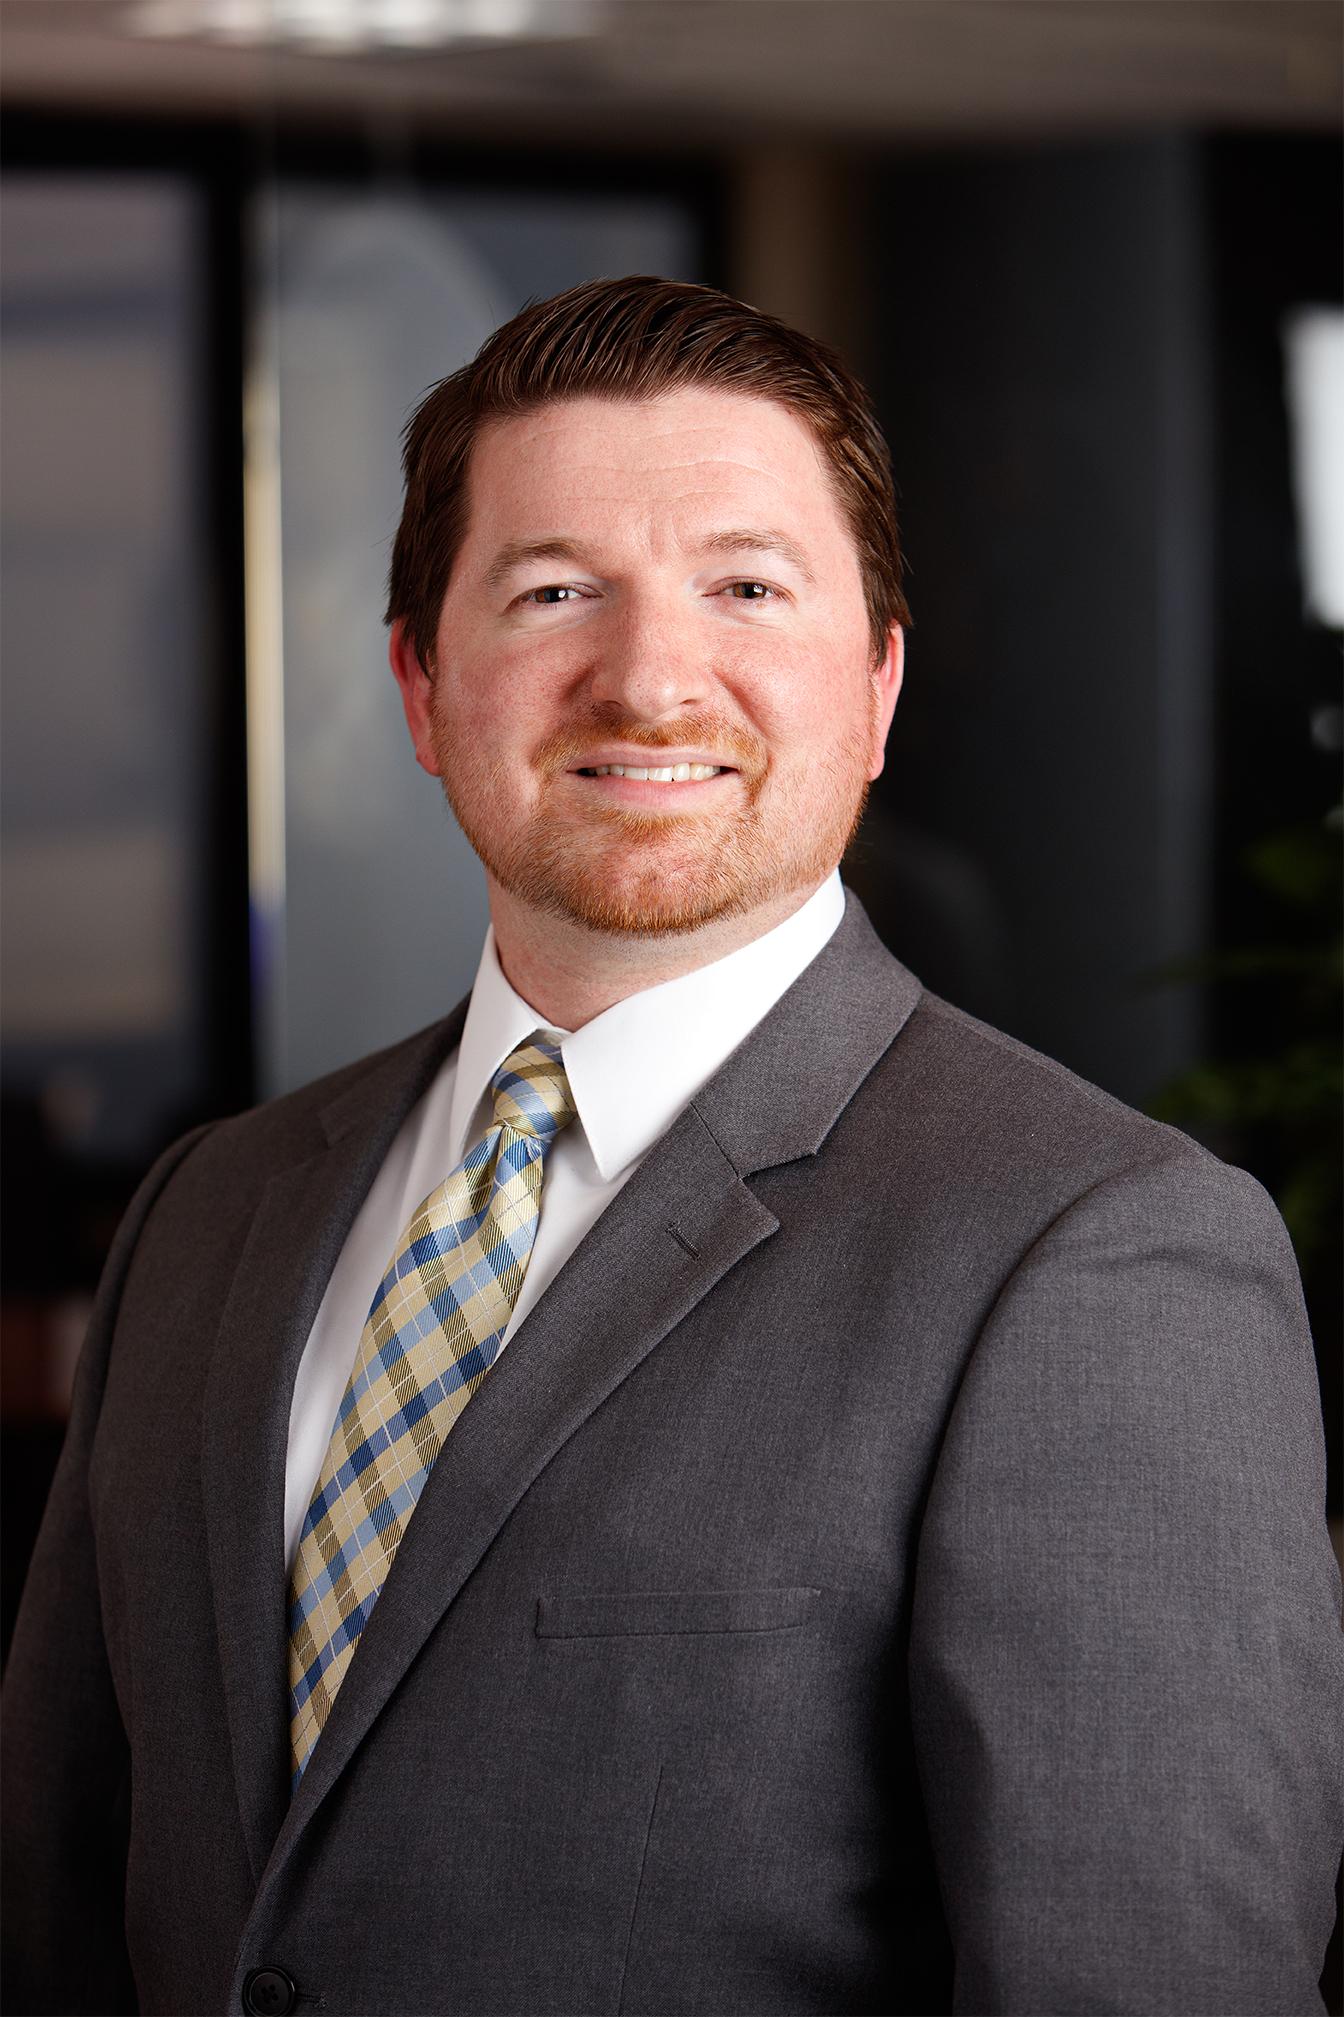 Portrait of EDCUtah Vice President of Research & Marketing, Matt Hilburn